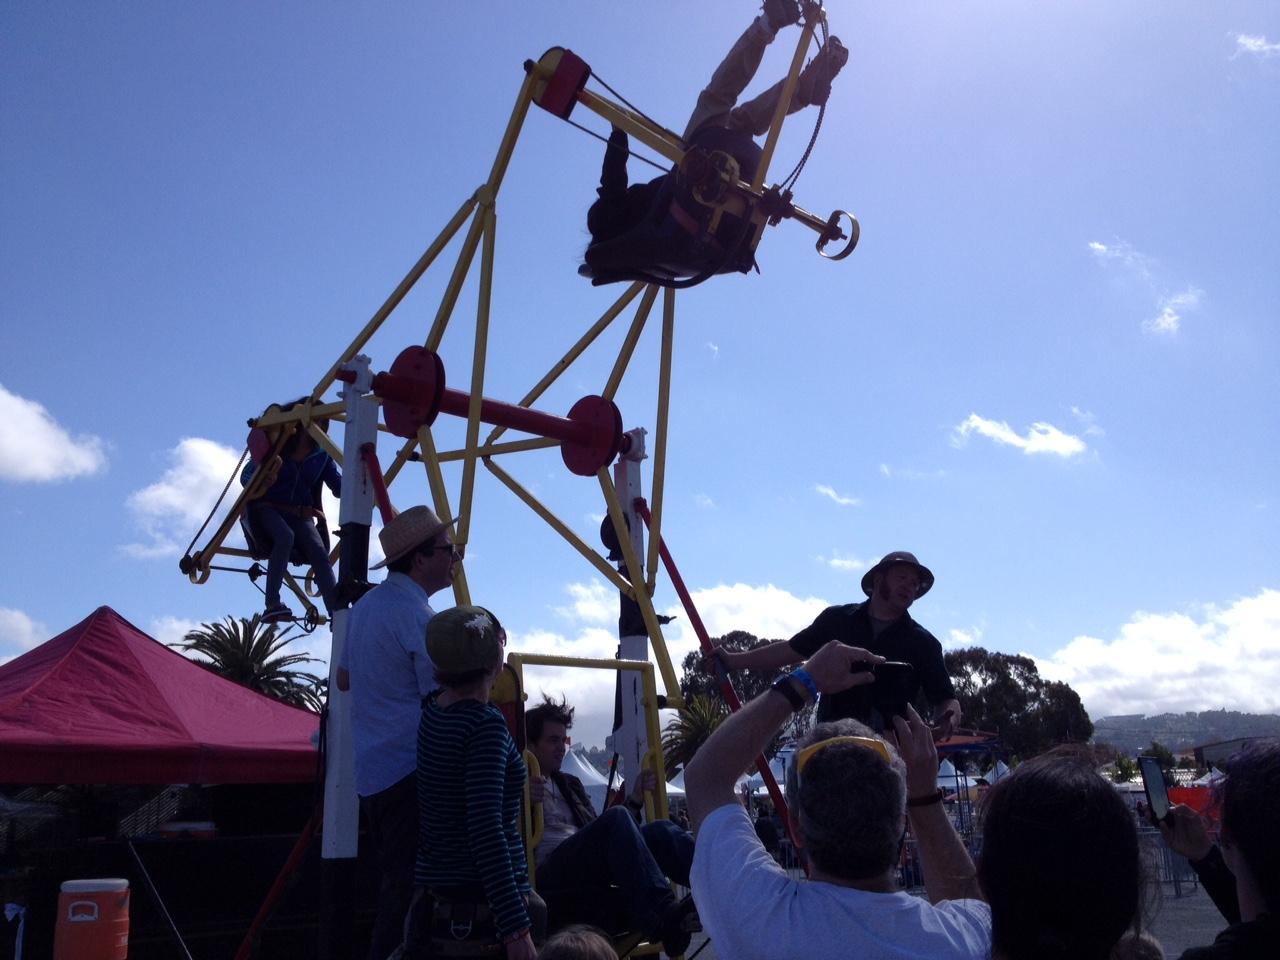 Pedal powered ferris wheel!